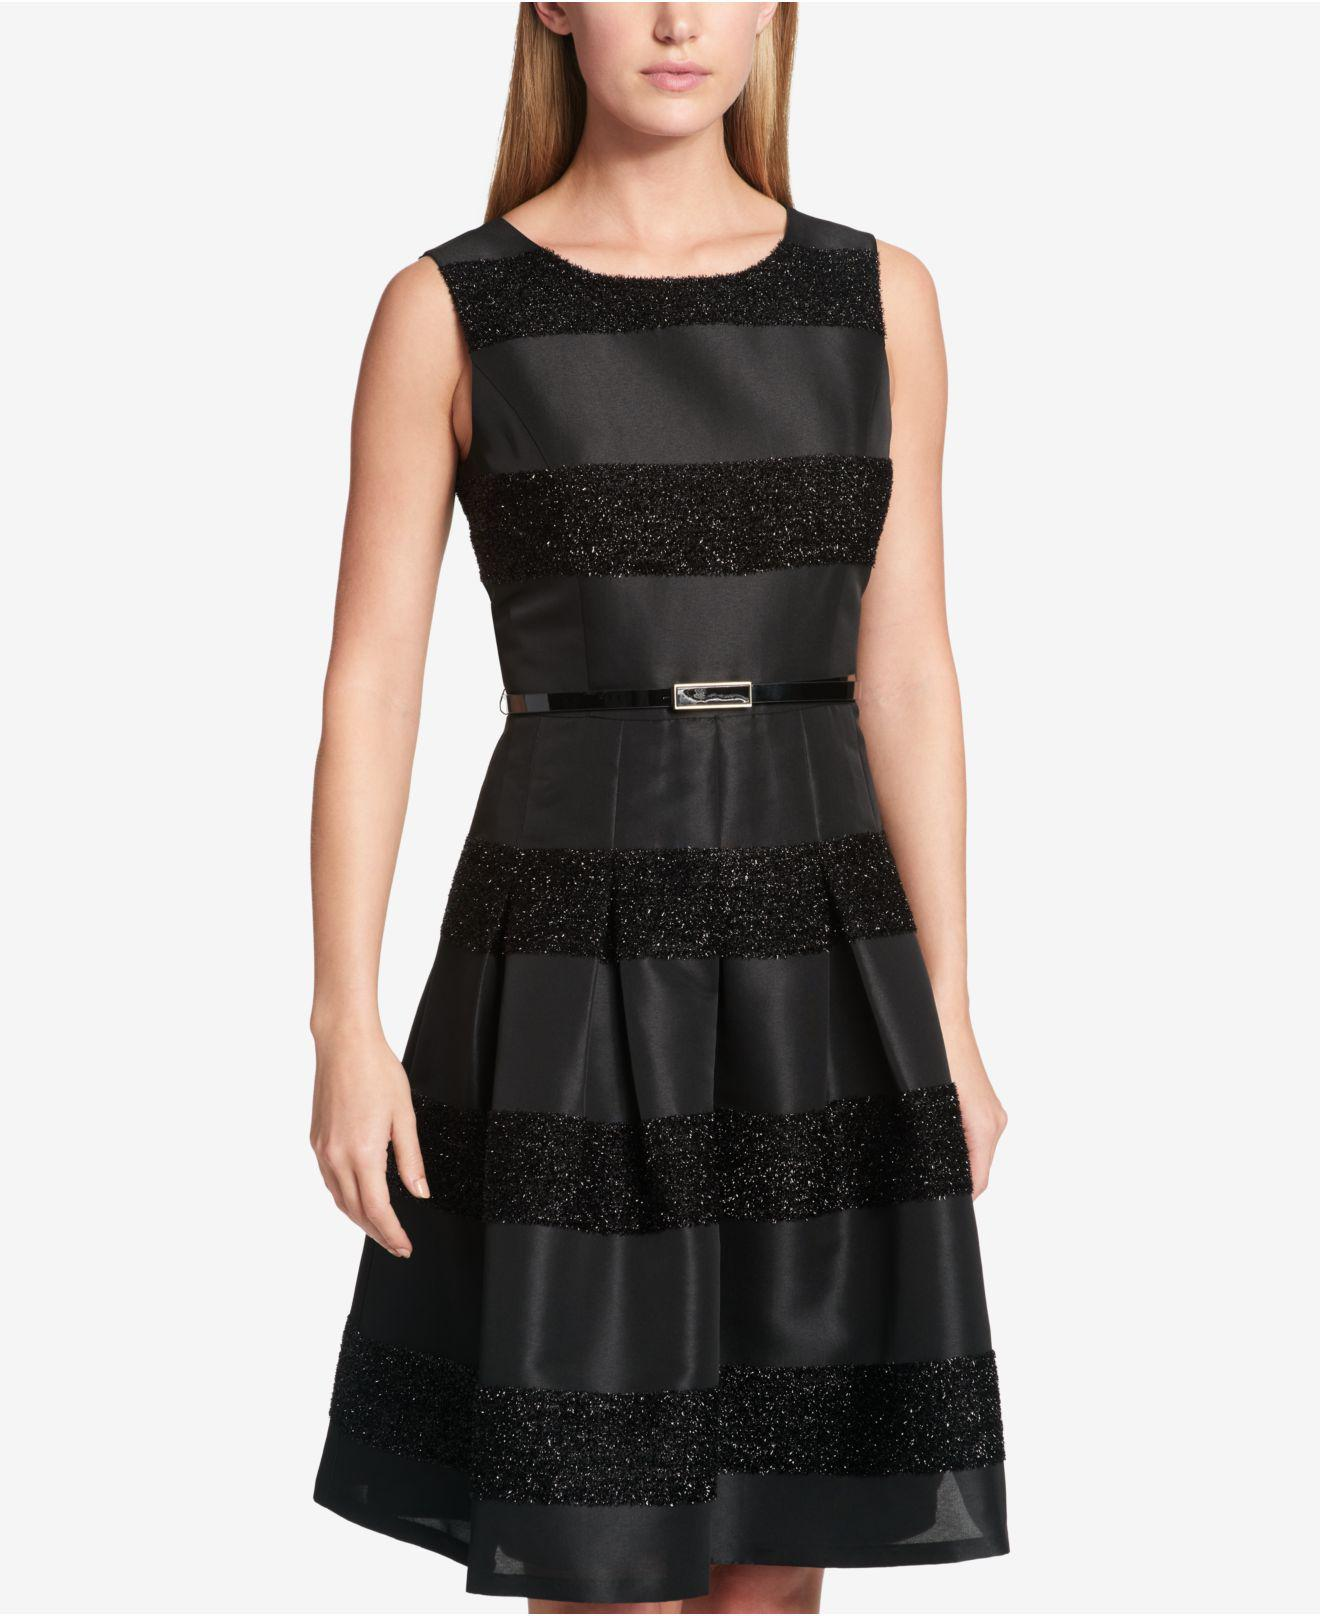 9c9350c292bb Lyst - Tommy Hilfiger Striped Fit   Flare Dress in Black - Save 48%